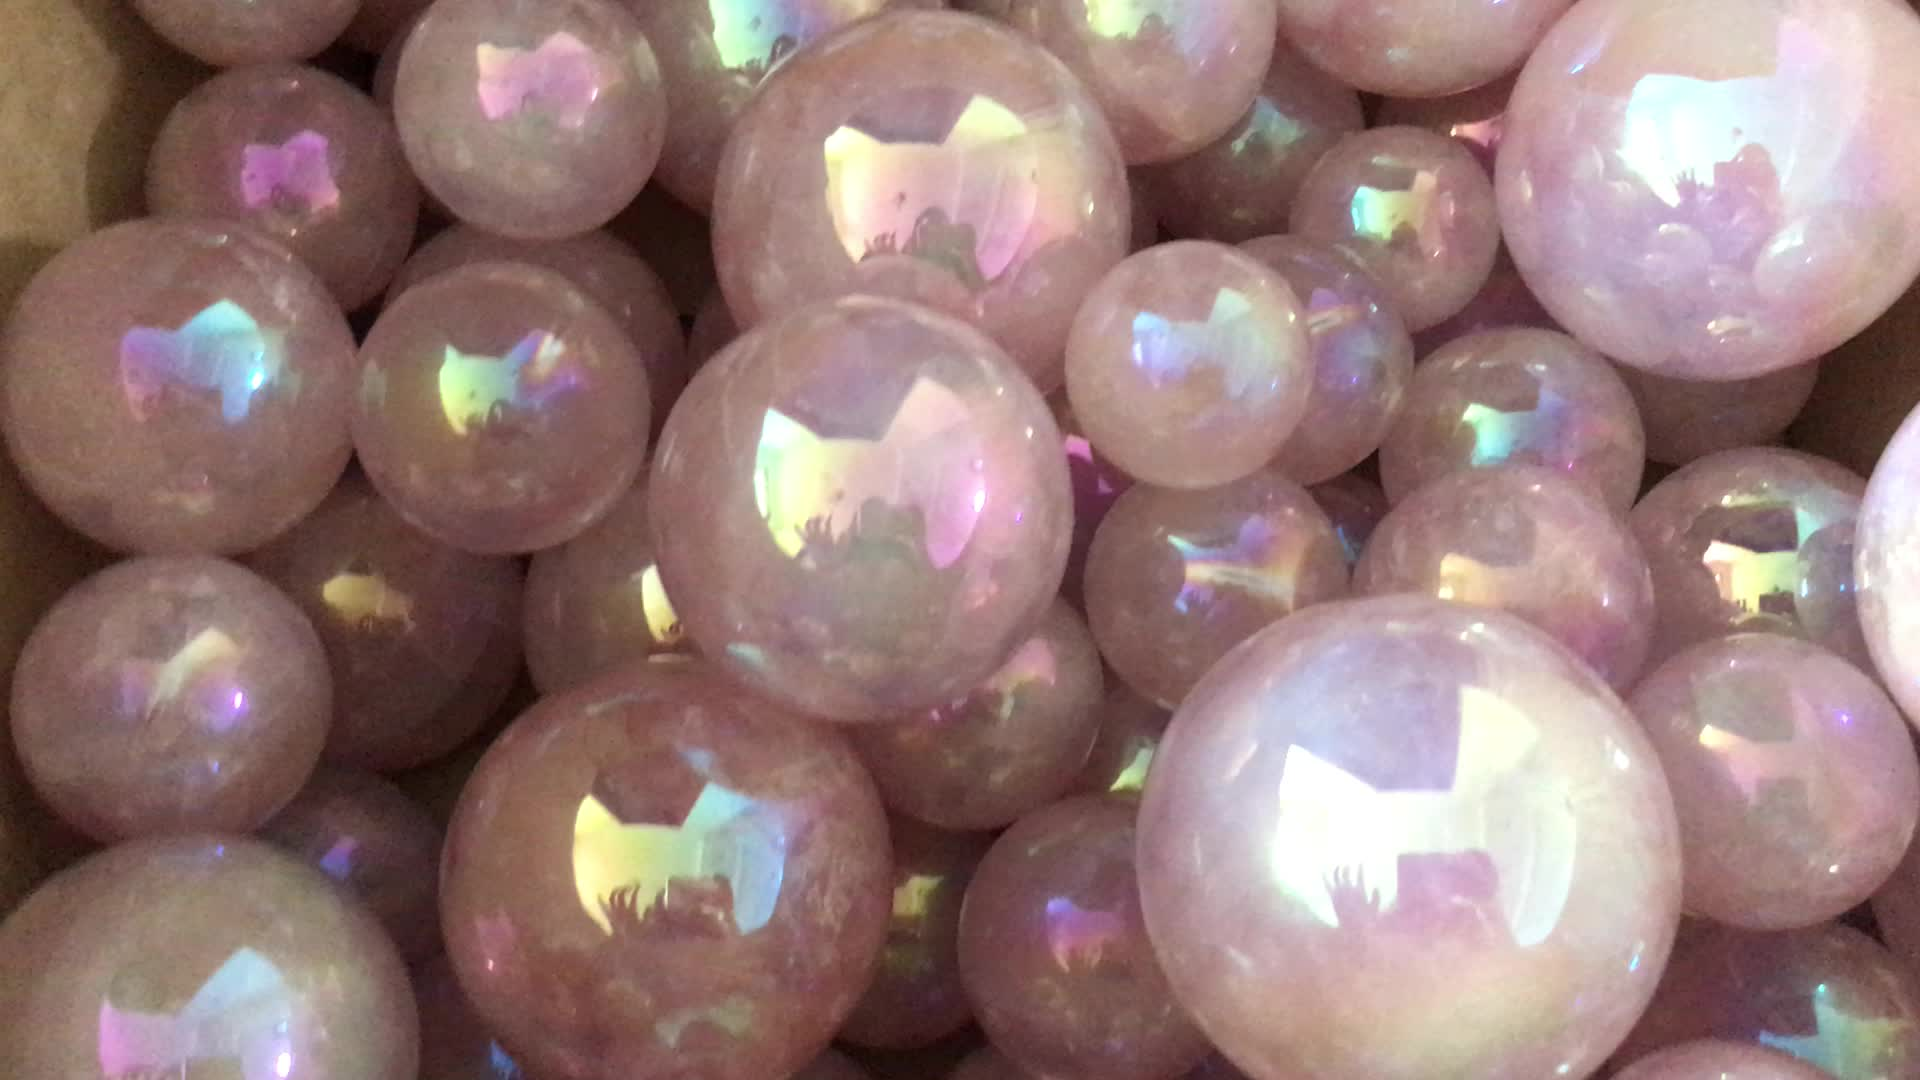 Natural Aura de Ángel cuarzo rosa bola de cristal de cuarzo rosa esfera de cristal para la venta